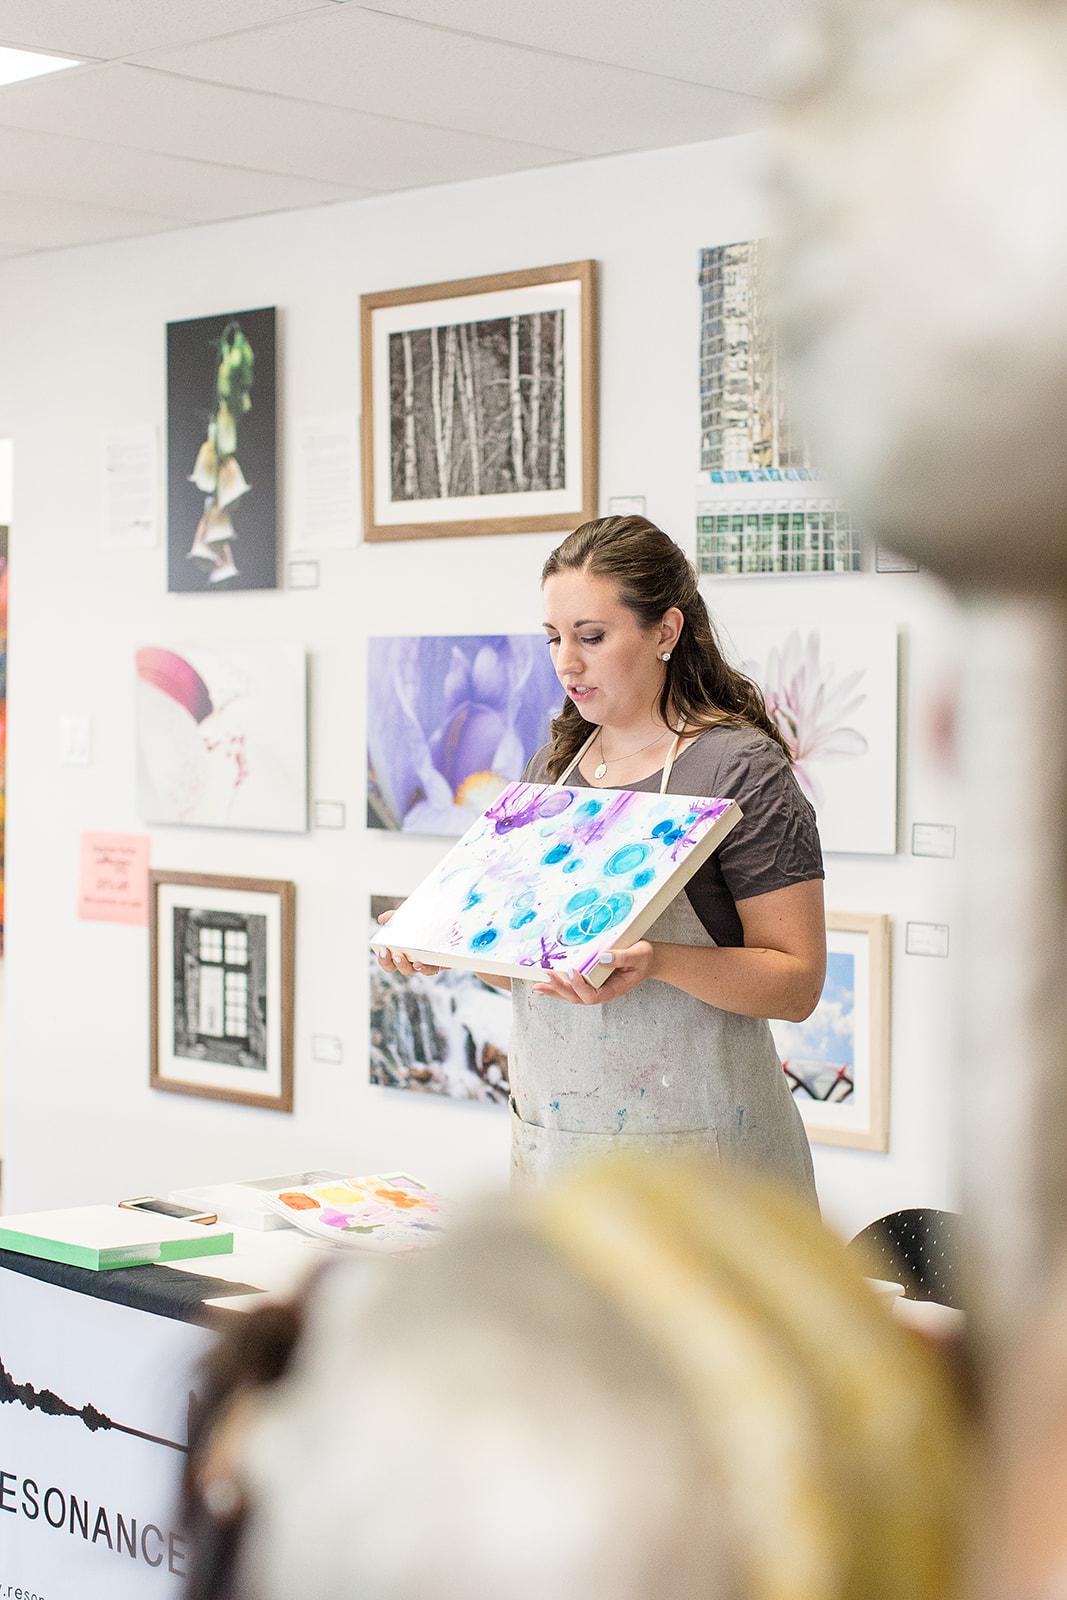 Resonance-art-studio-workshop-brand-photography-print-010.jpg